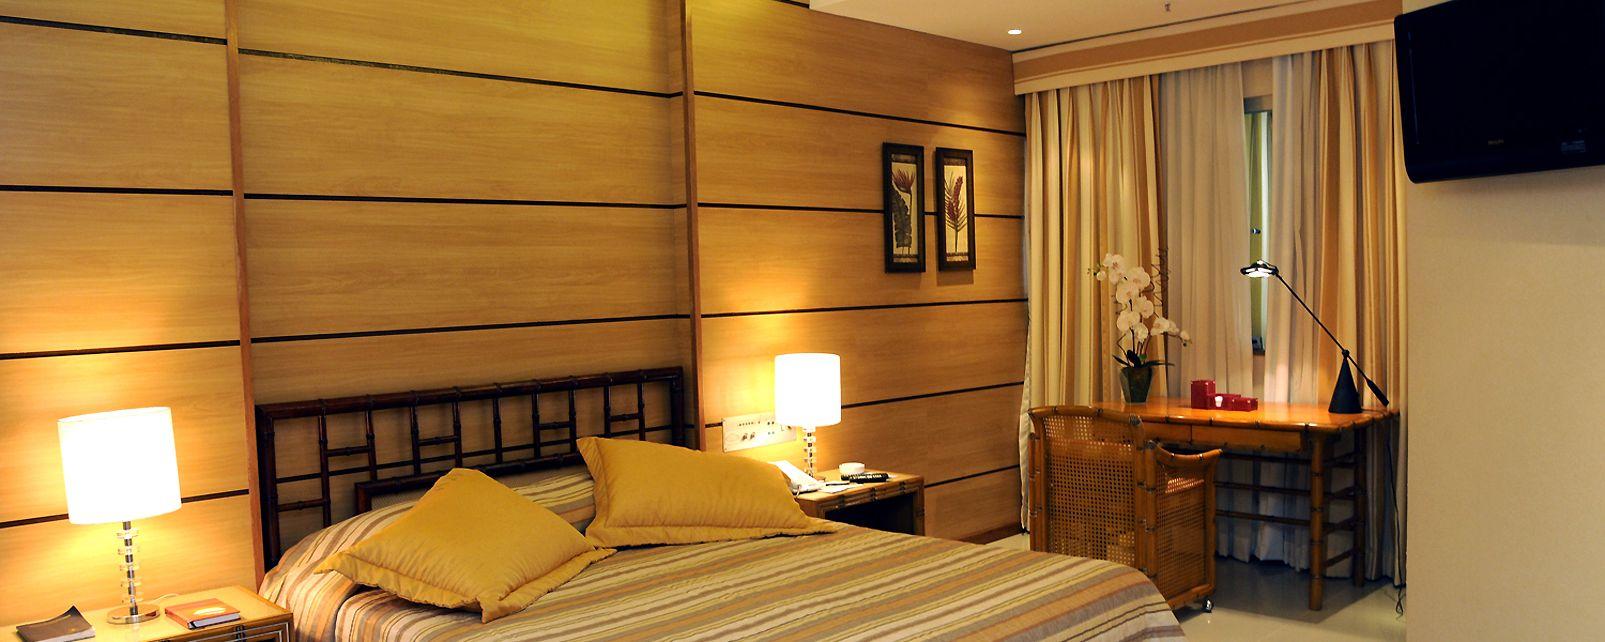 Hotel Mirador Rio